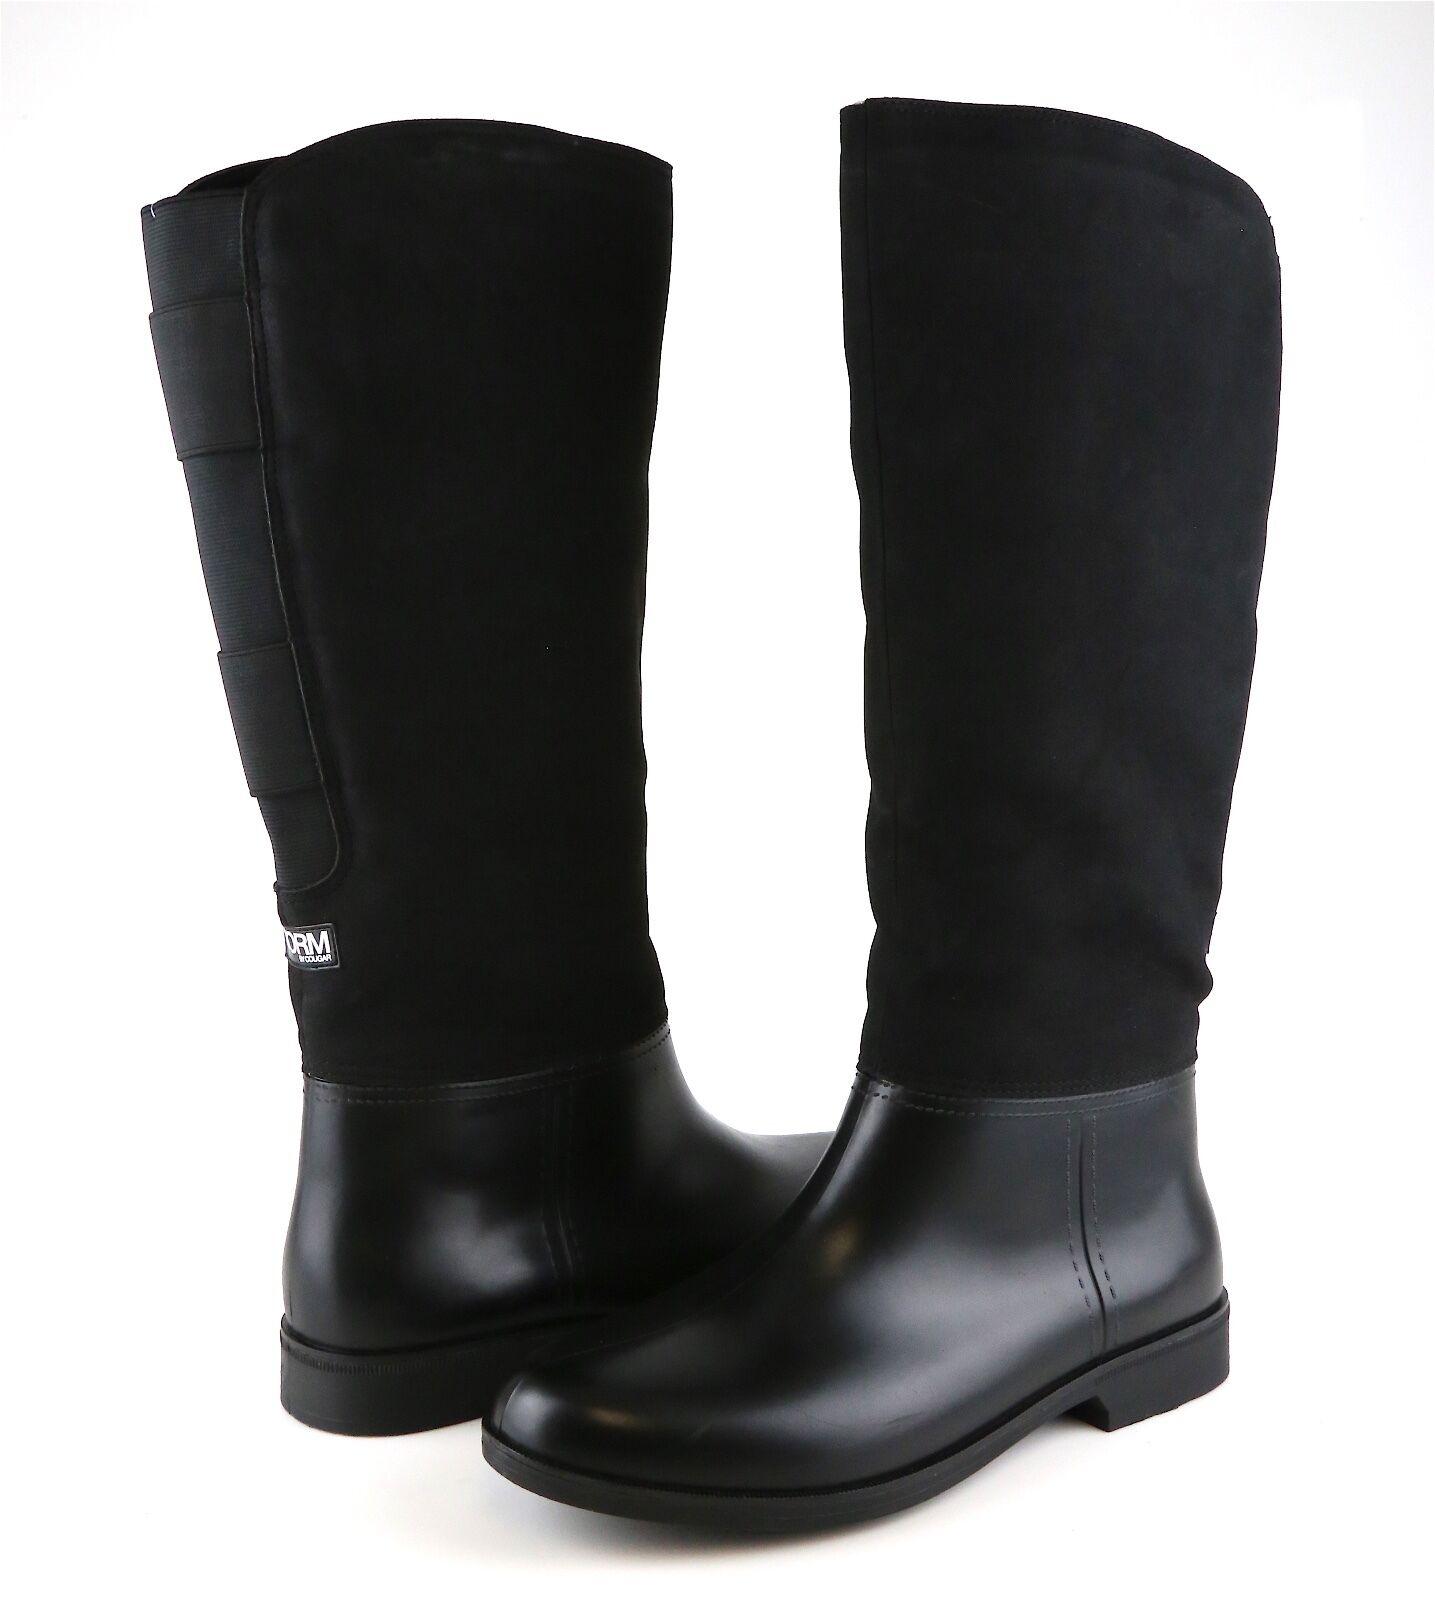 Storm por Cougar Negro Street 2 Negro Cougar Impermeable botas 8497 tamaño 11 M  nuevo a2c16b